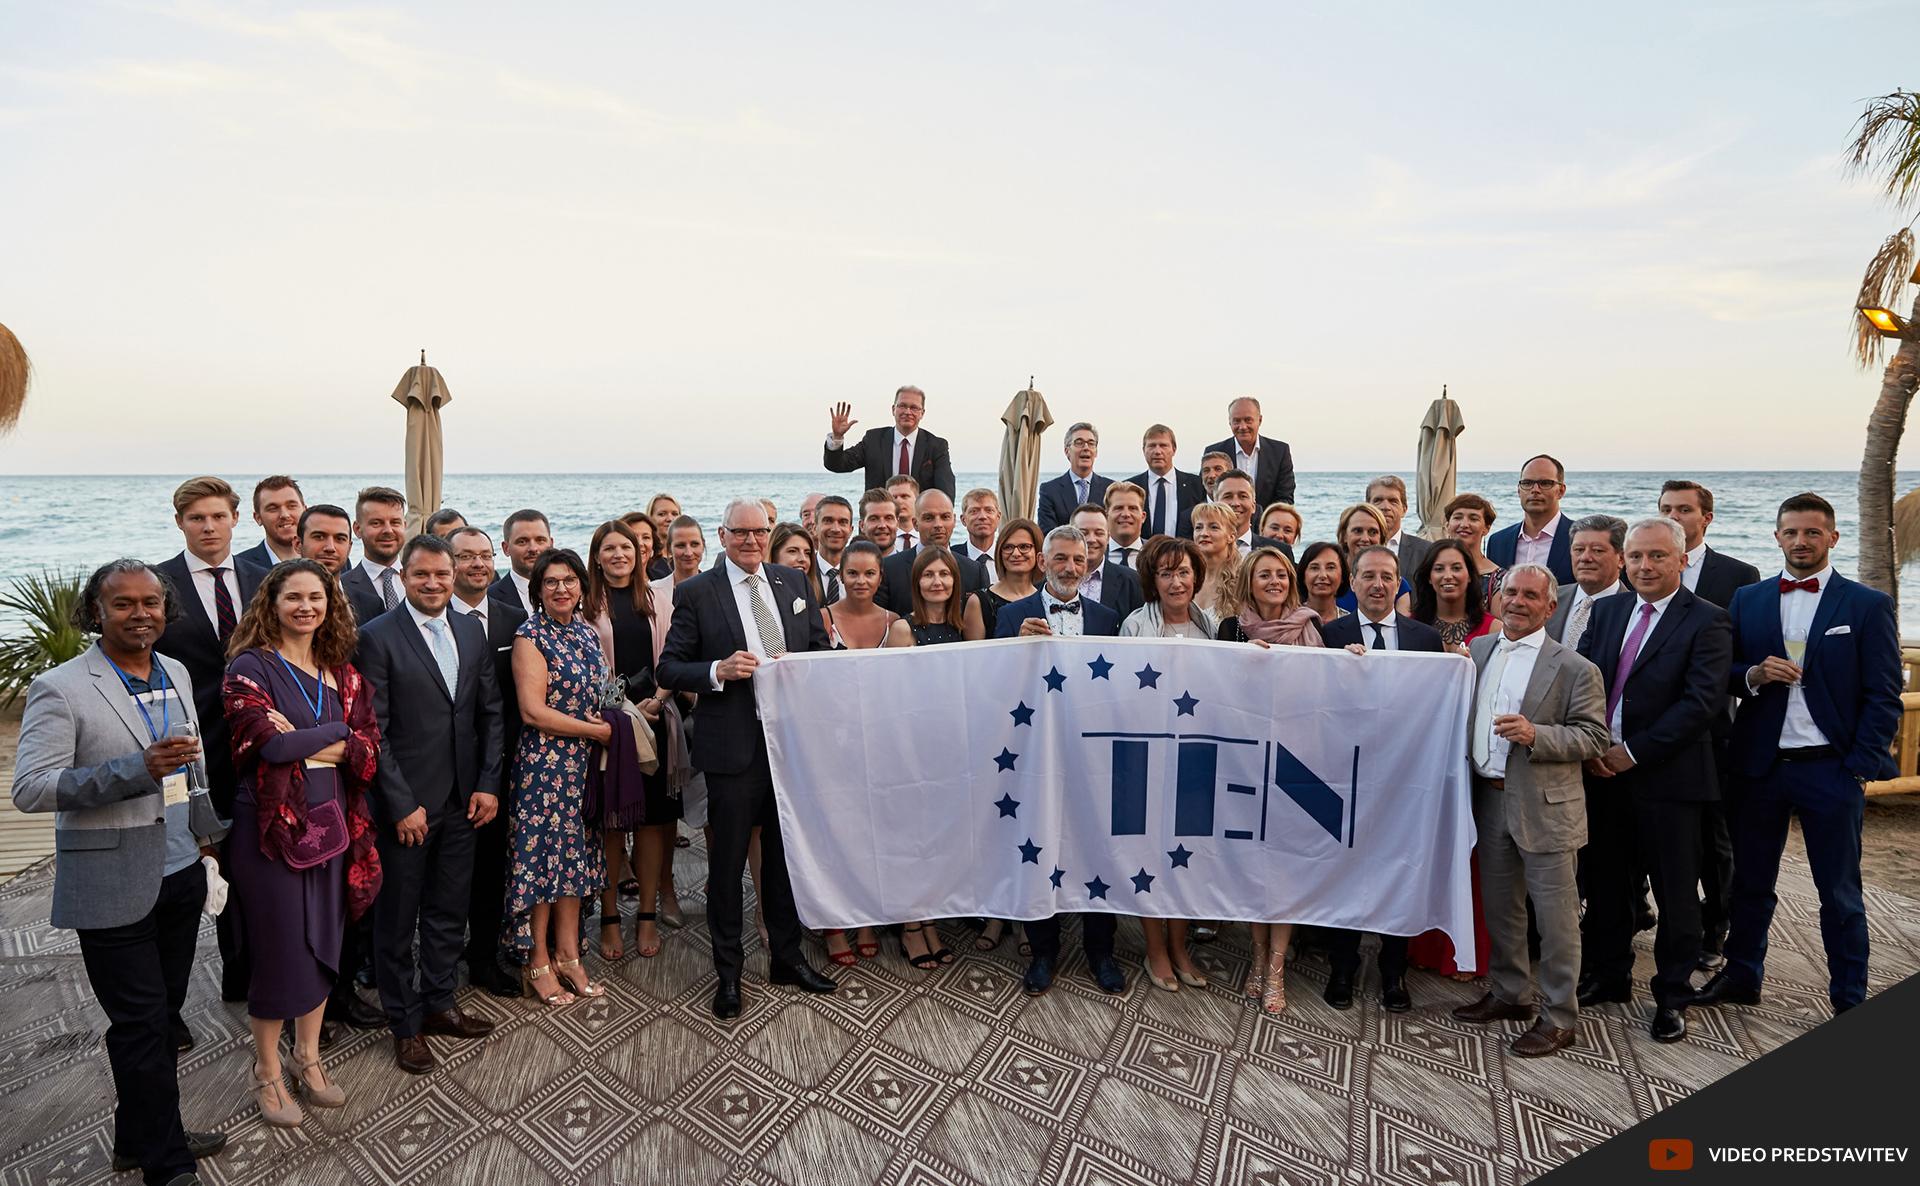 Grilc-Starc-Partnerji-Mednaroden-Povezave-TEN-The-European-Network